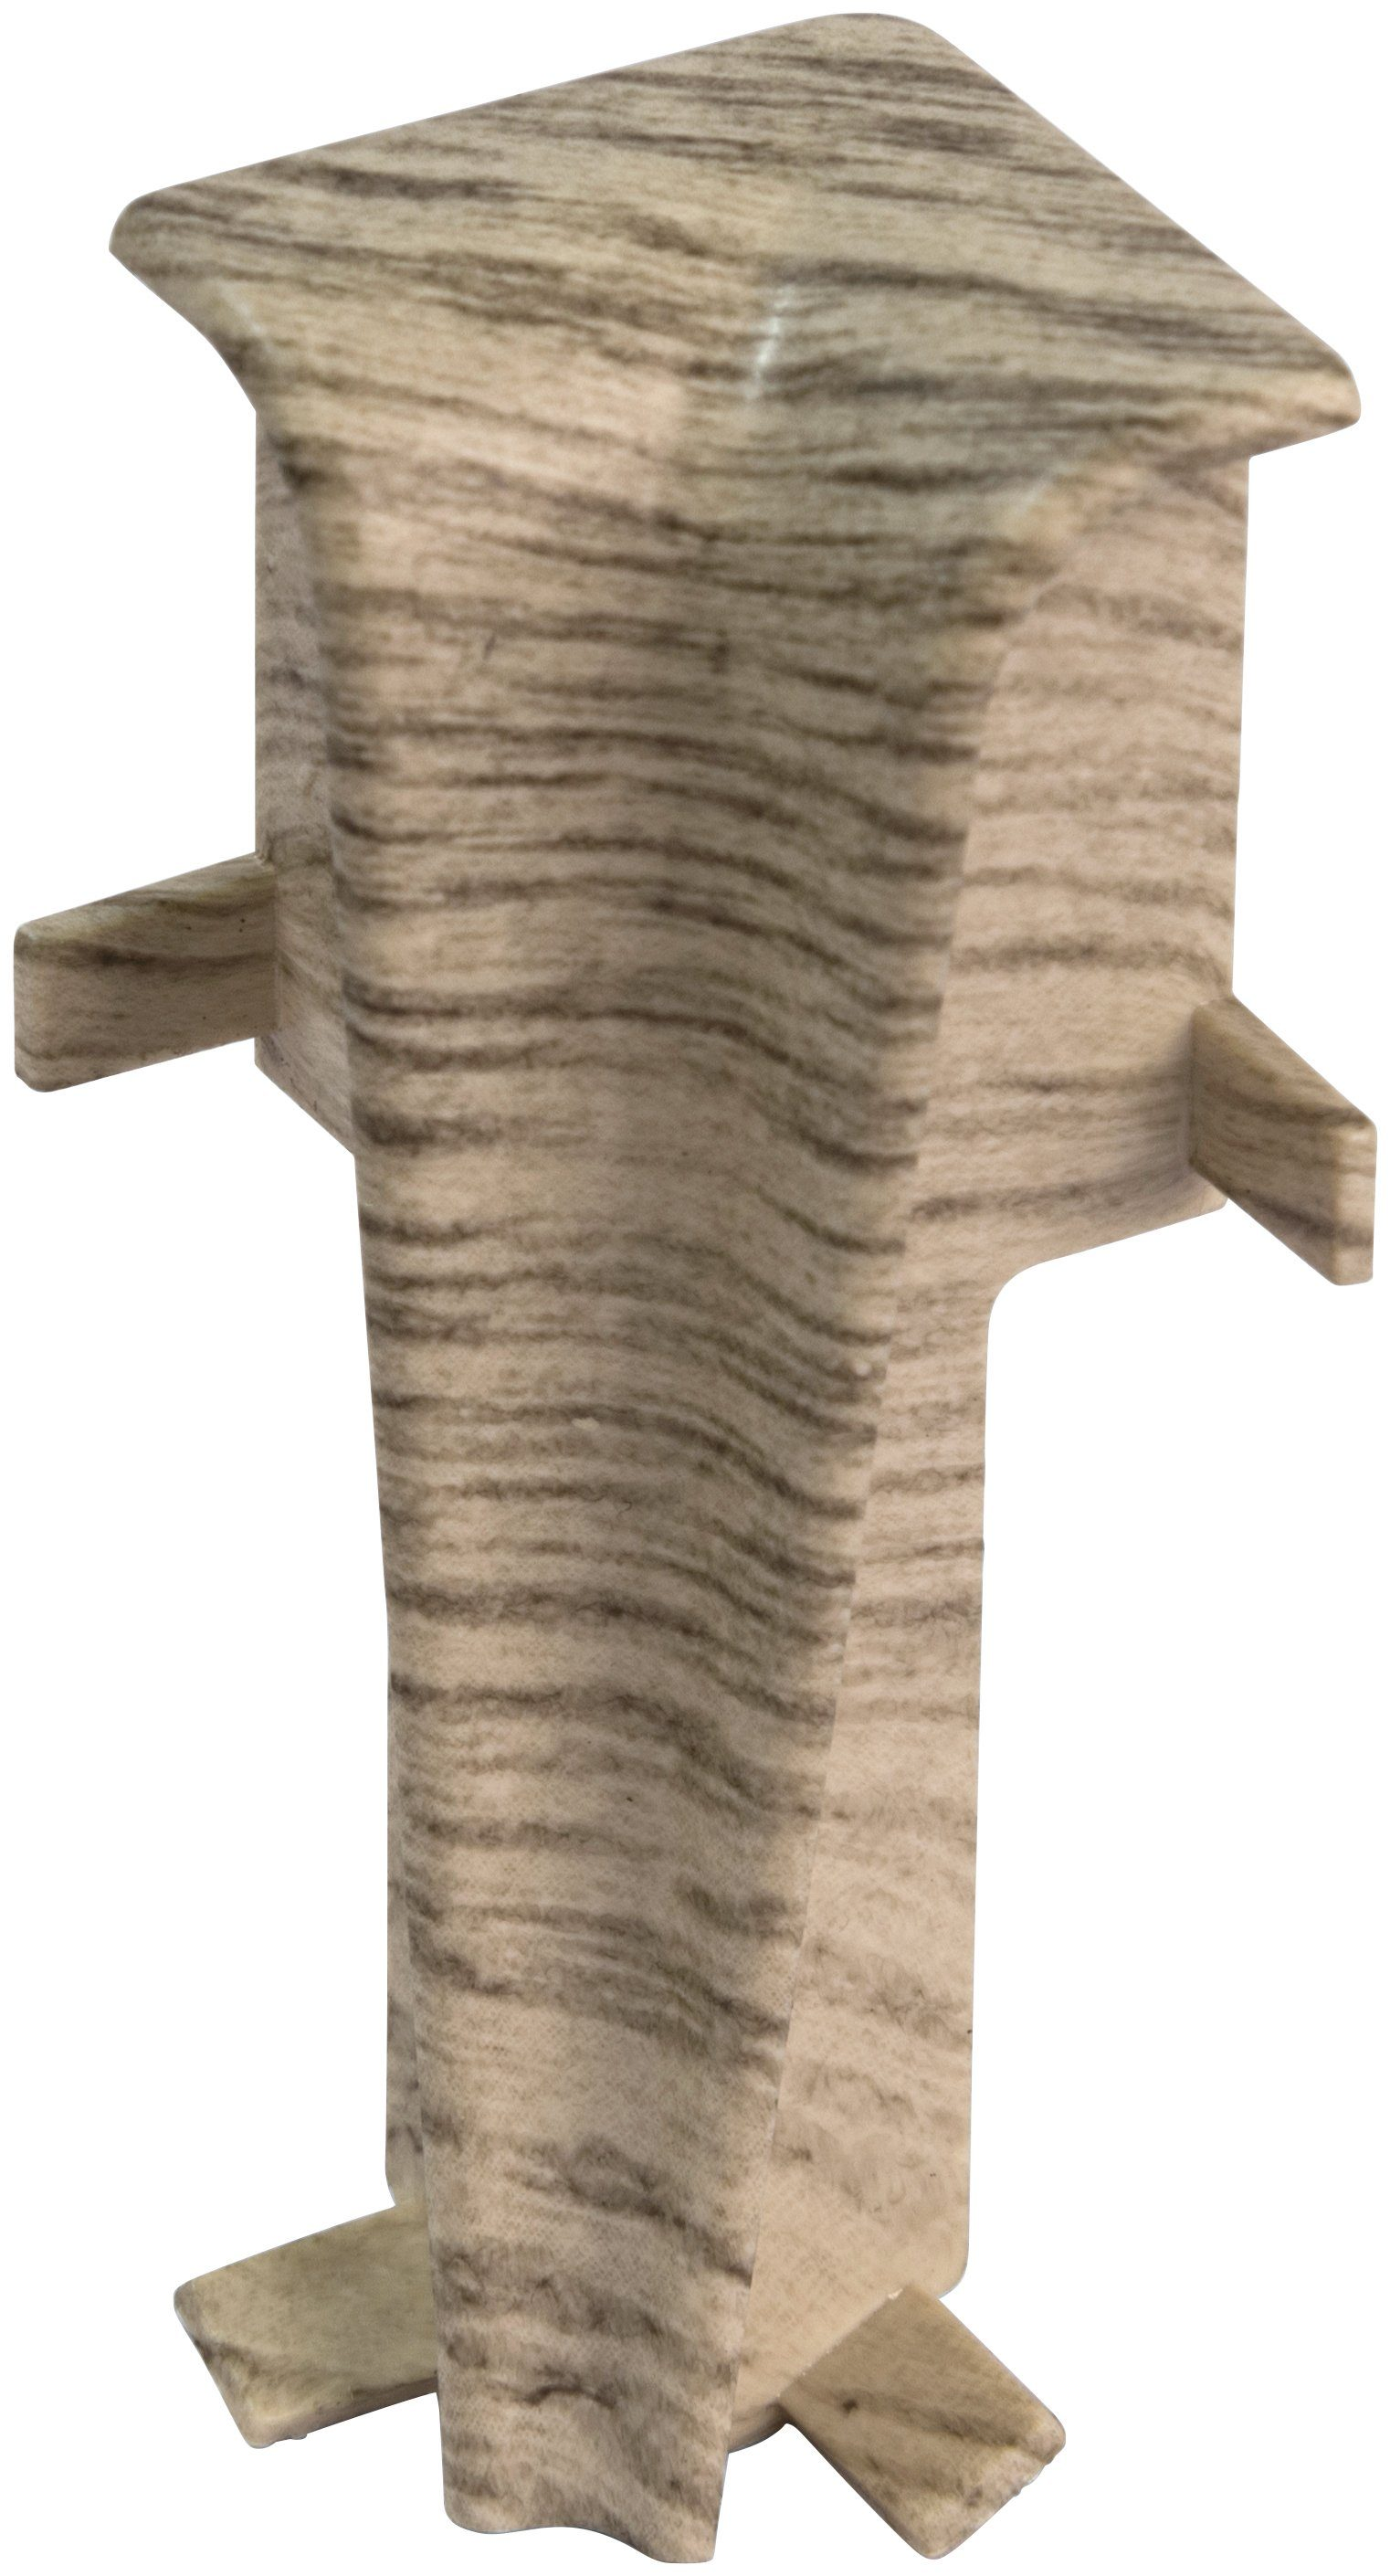 EGGER Innenecken »Eiche hellgrau«, für 6cm EGGER Sockelleiste